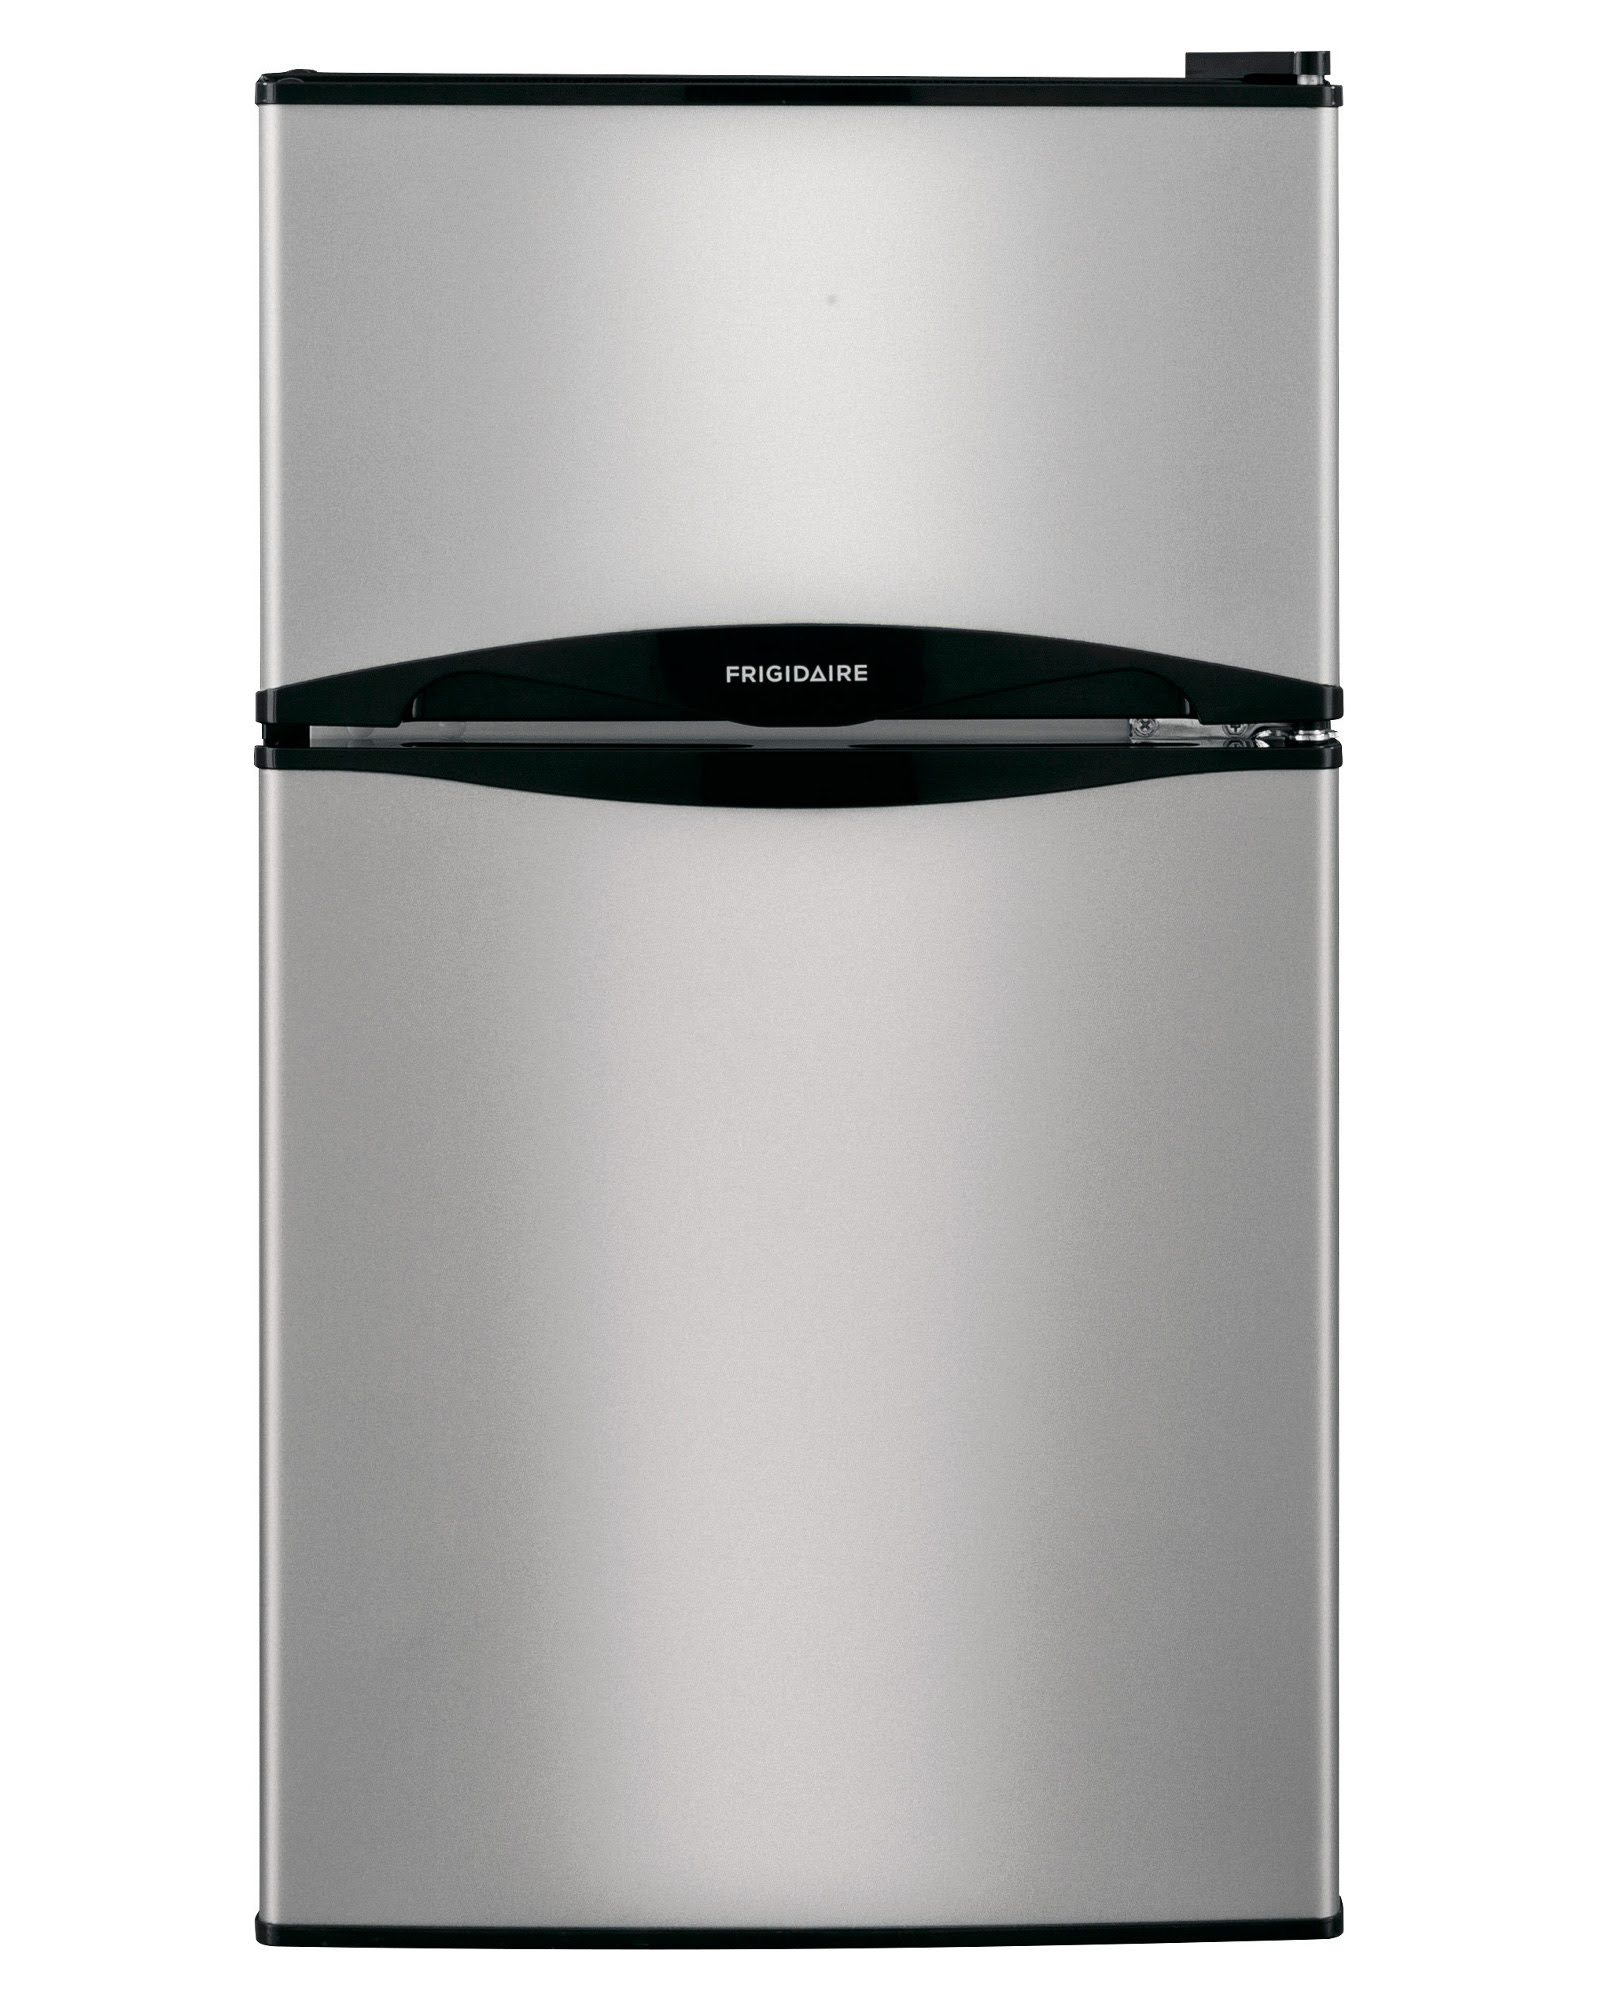 Frigidaire FFPS4533QM 4 5 cu ft pact Refrigerator Silver Mist